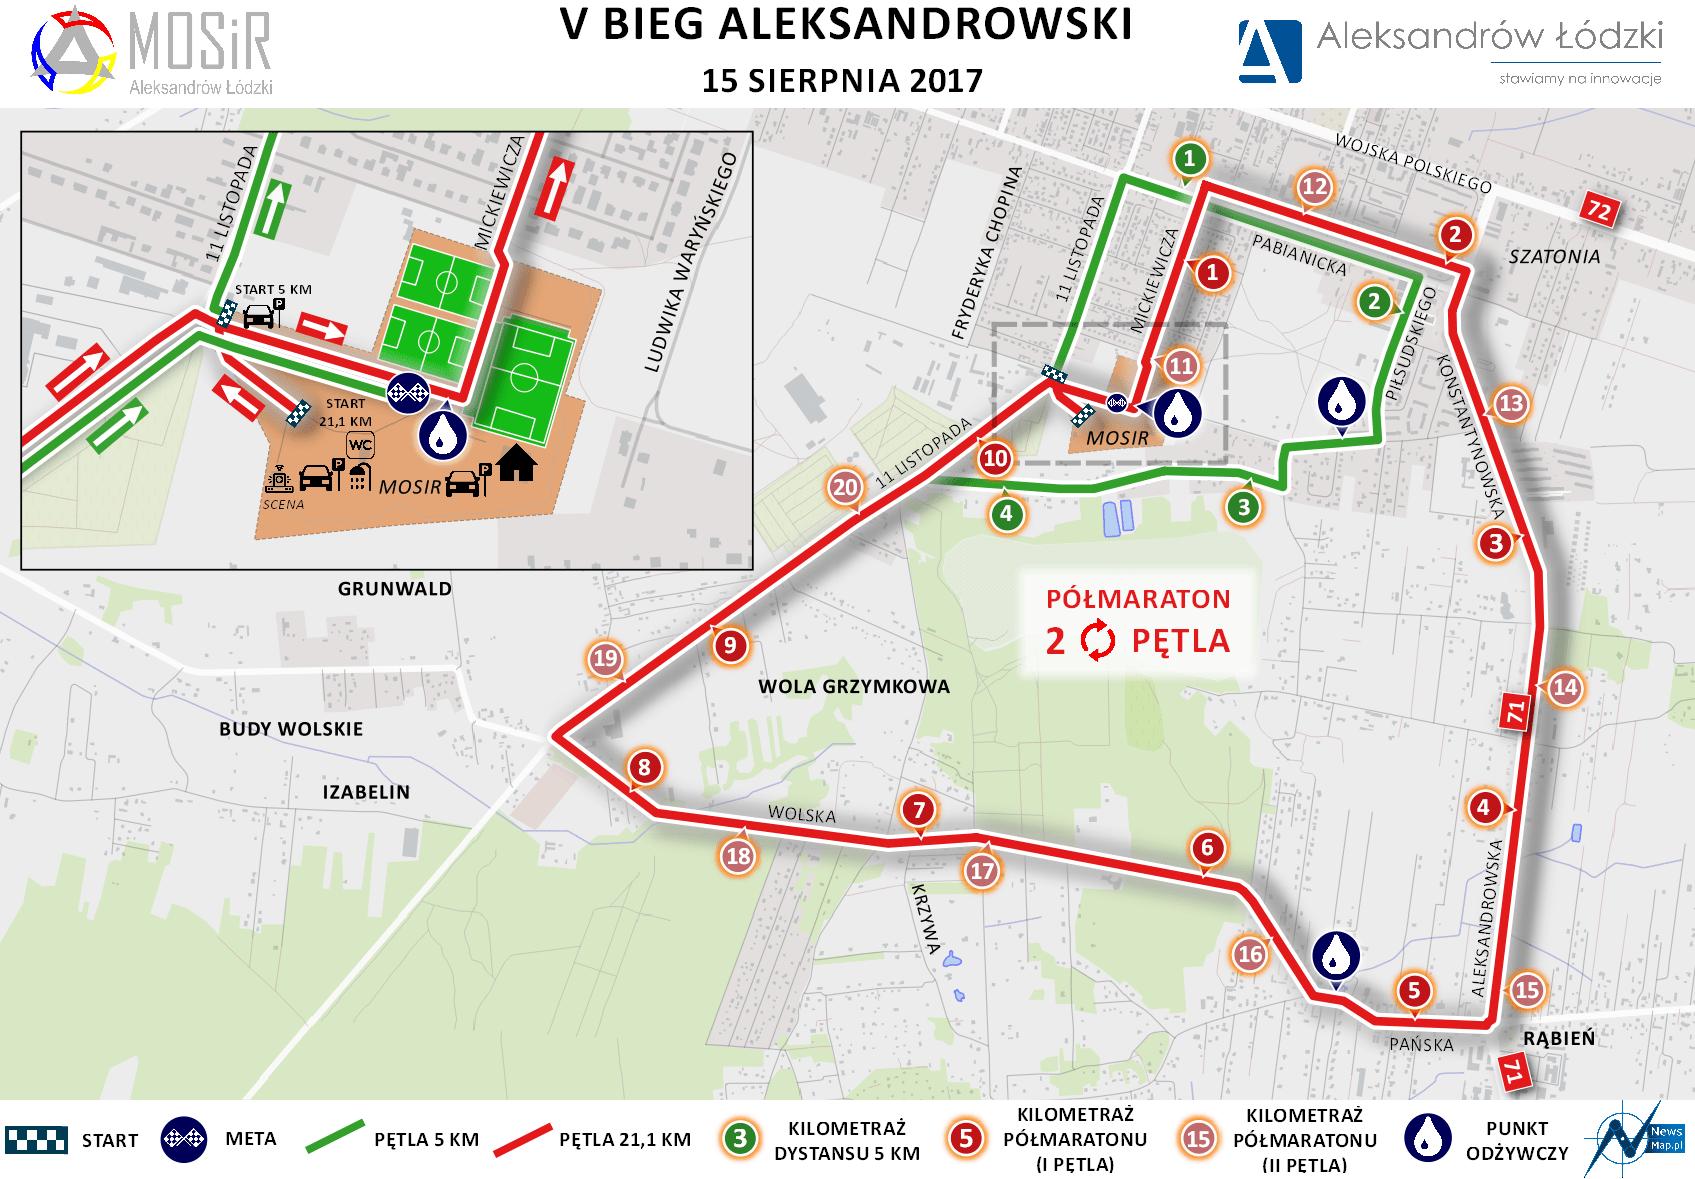 Aleksandrów (on-line)